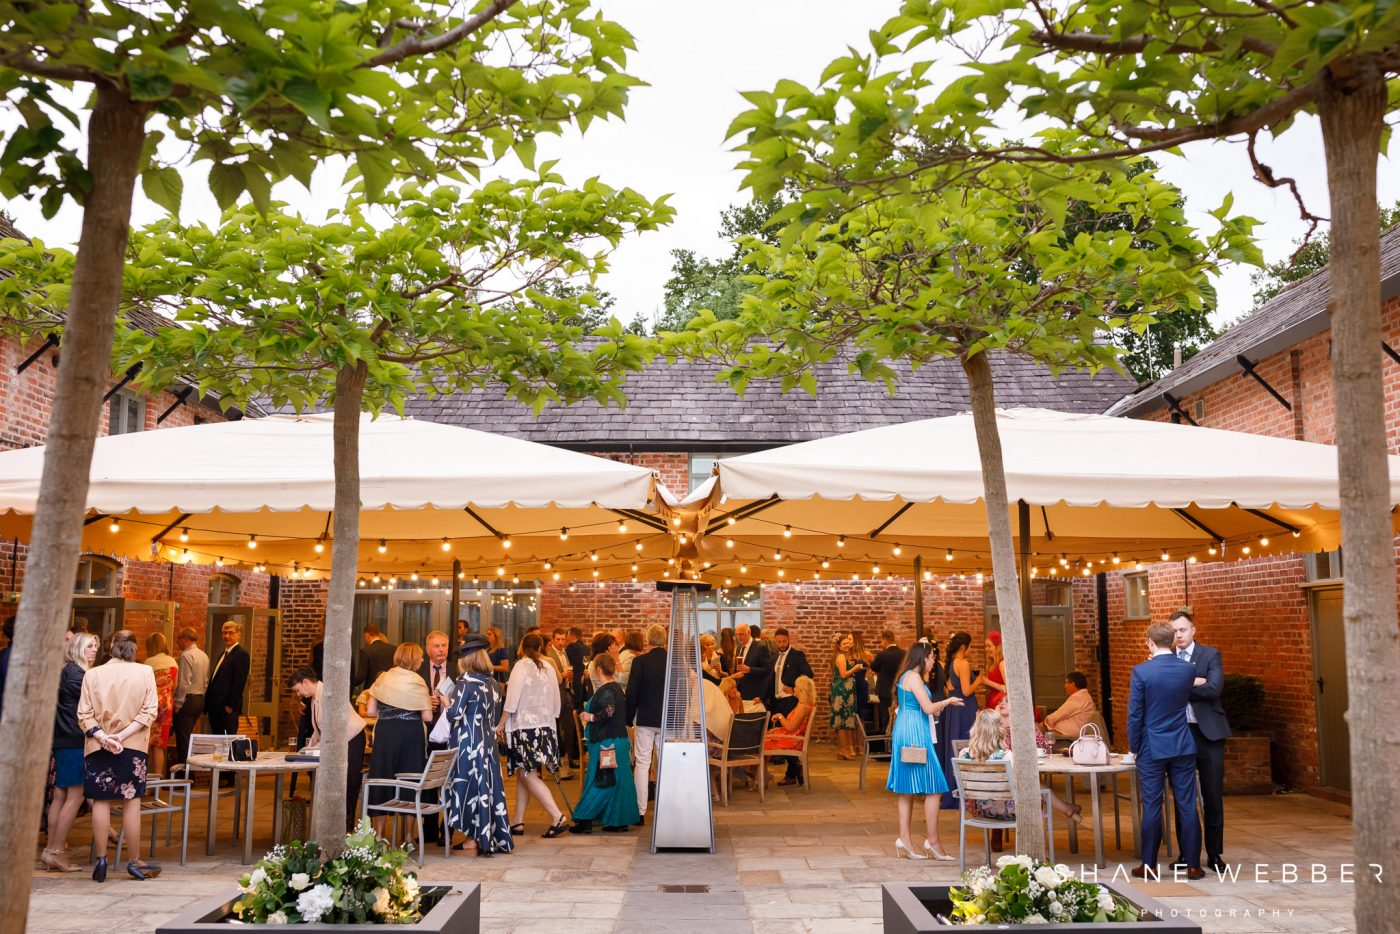 Arley Hall & Gardens Wedding Venue